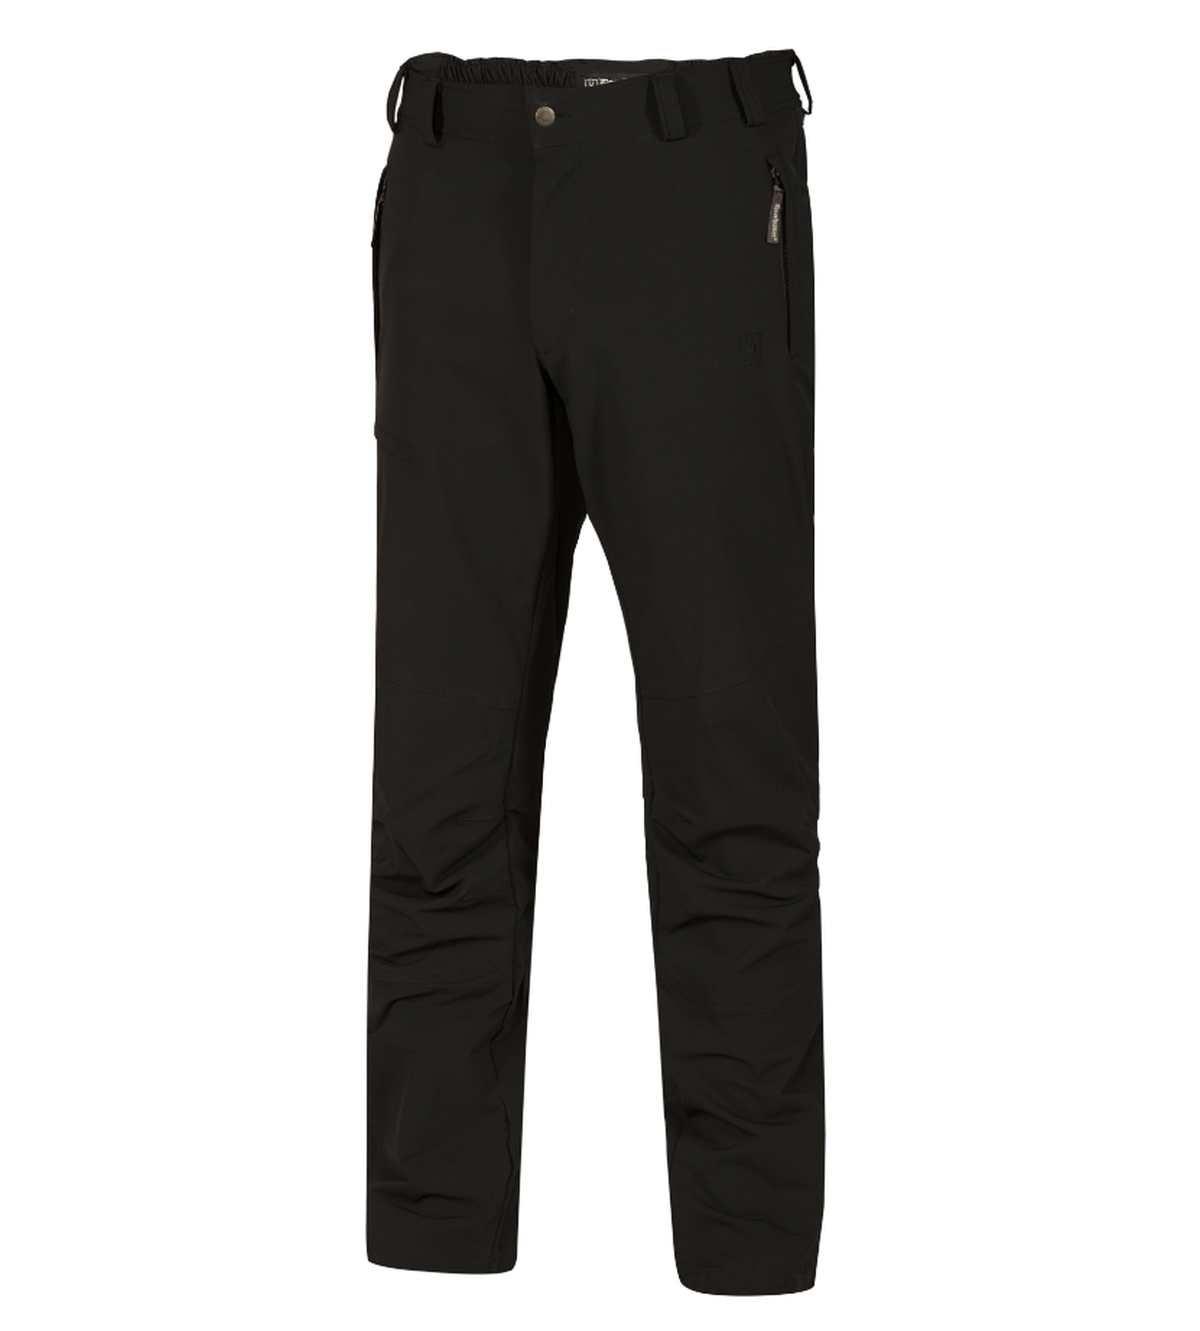 DEERHUNTER STRIKE completamente elasticizzata pantaloni neri - C50